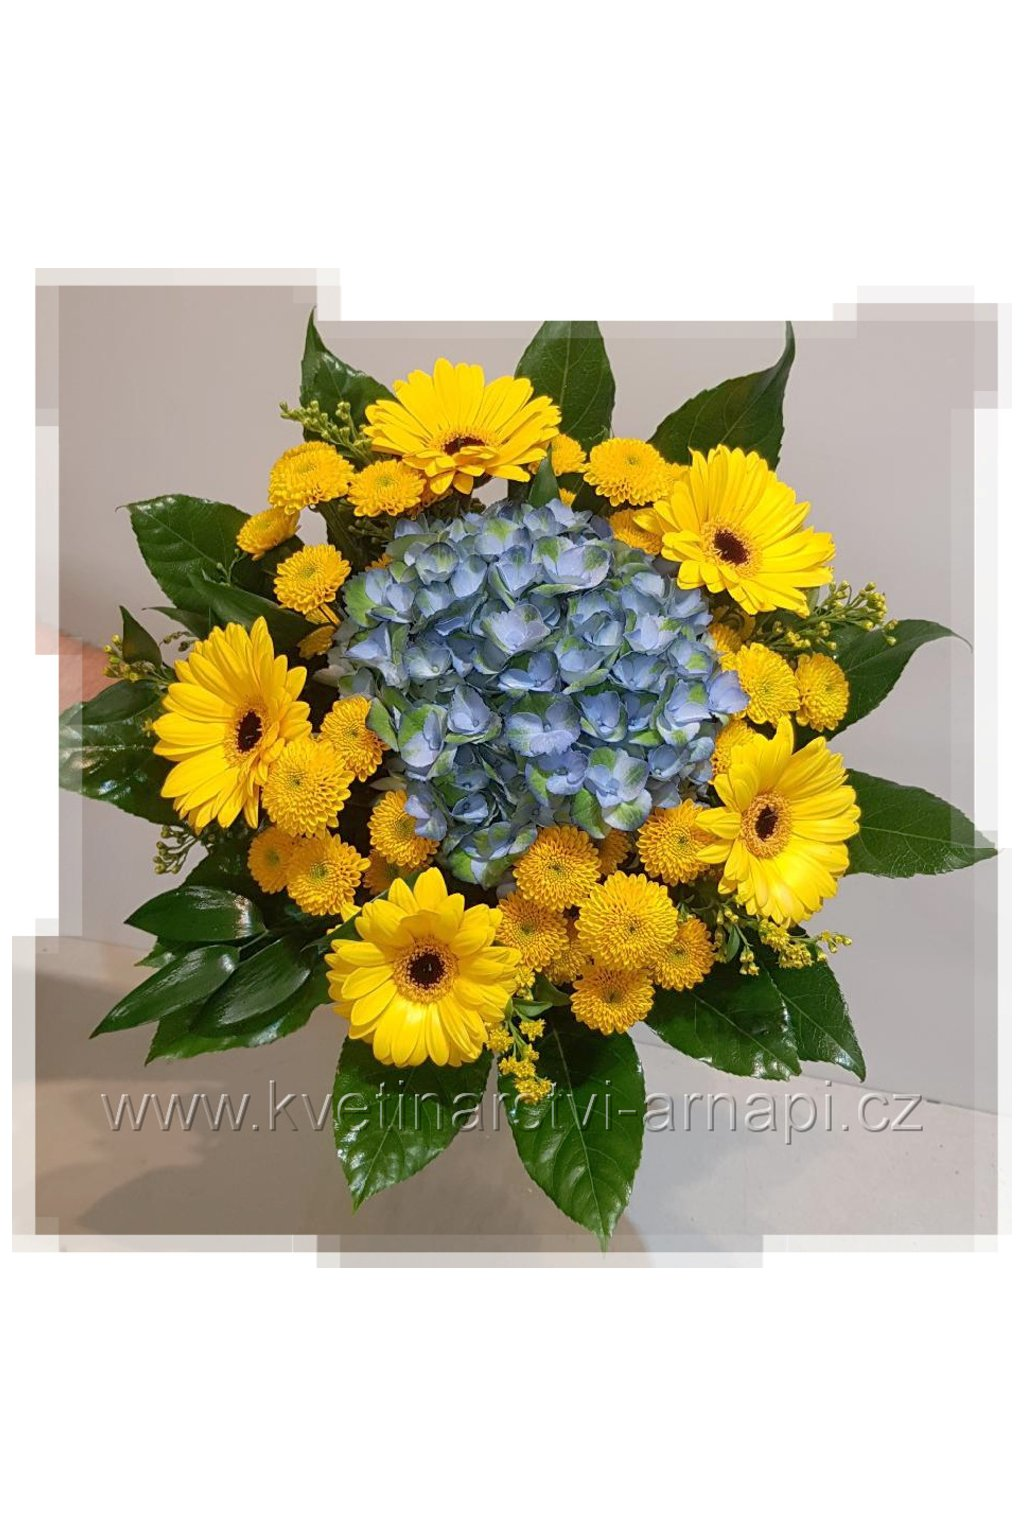 darkova kytice hortenzie gerbery eshop kvetinarstvi arnapi